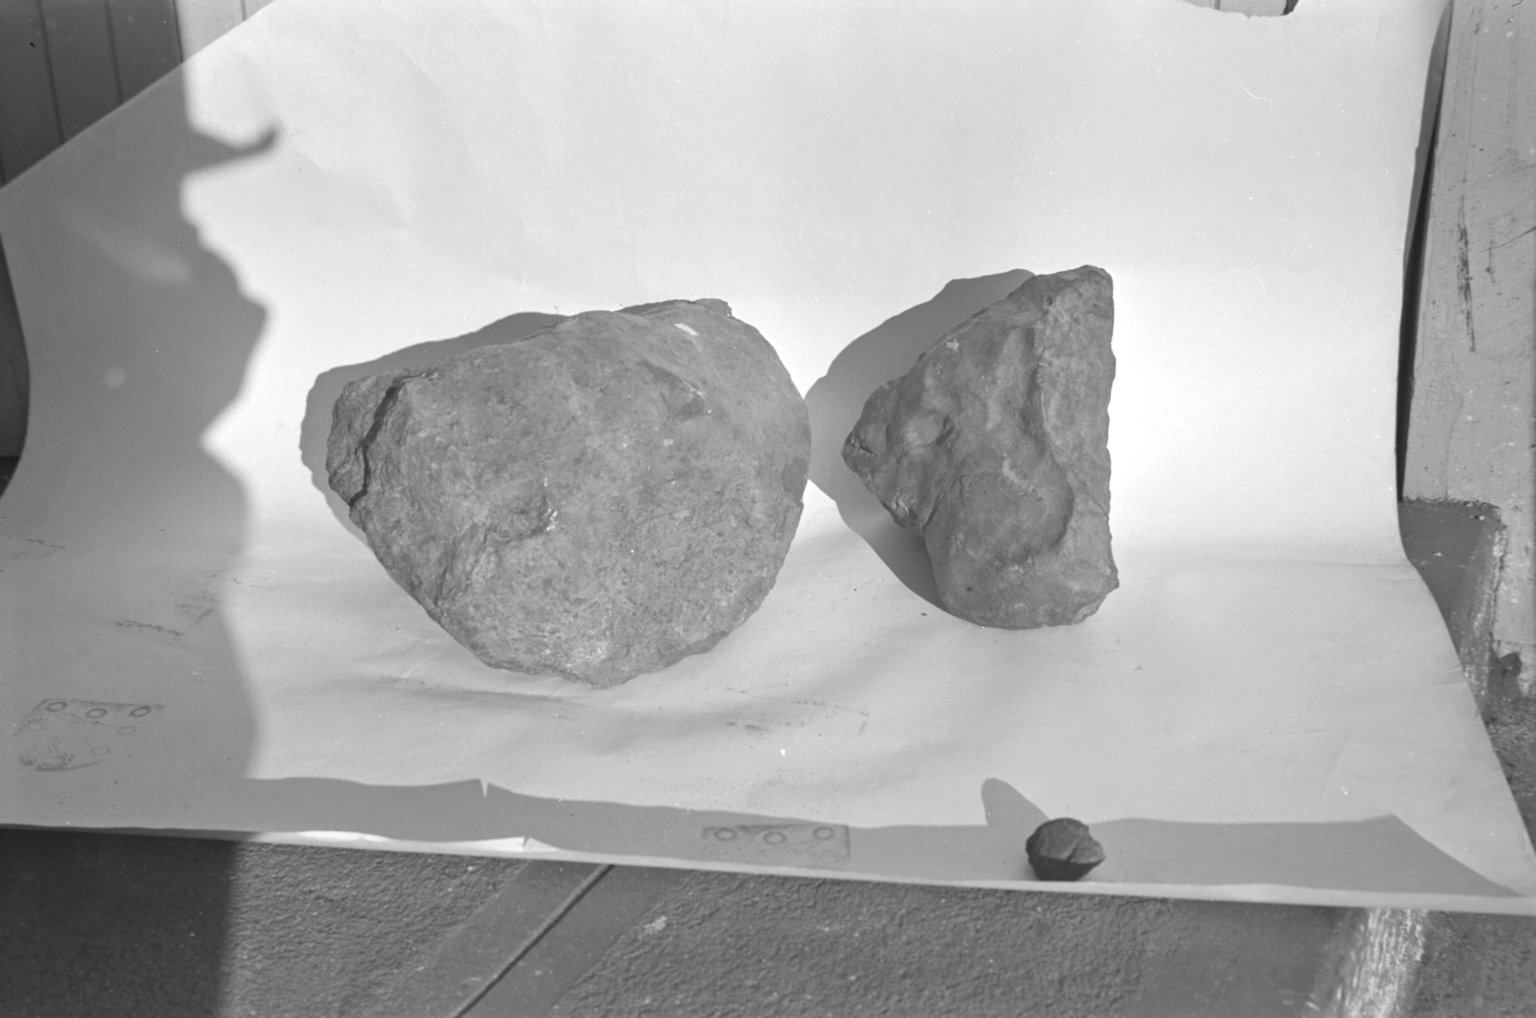 Two specimens